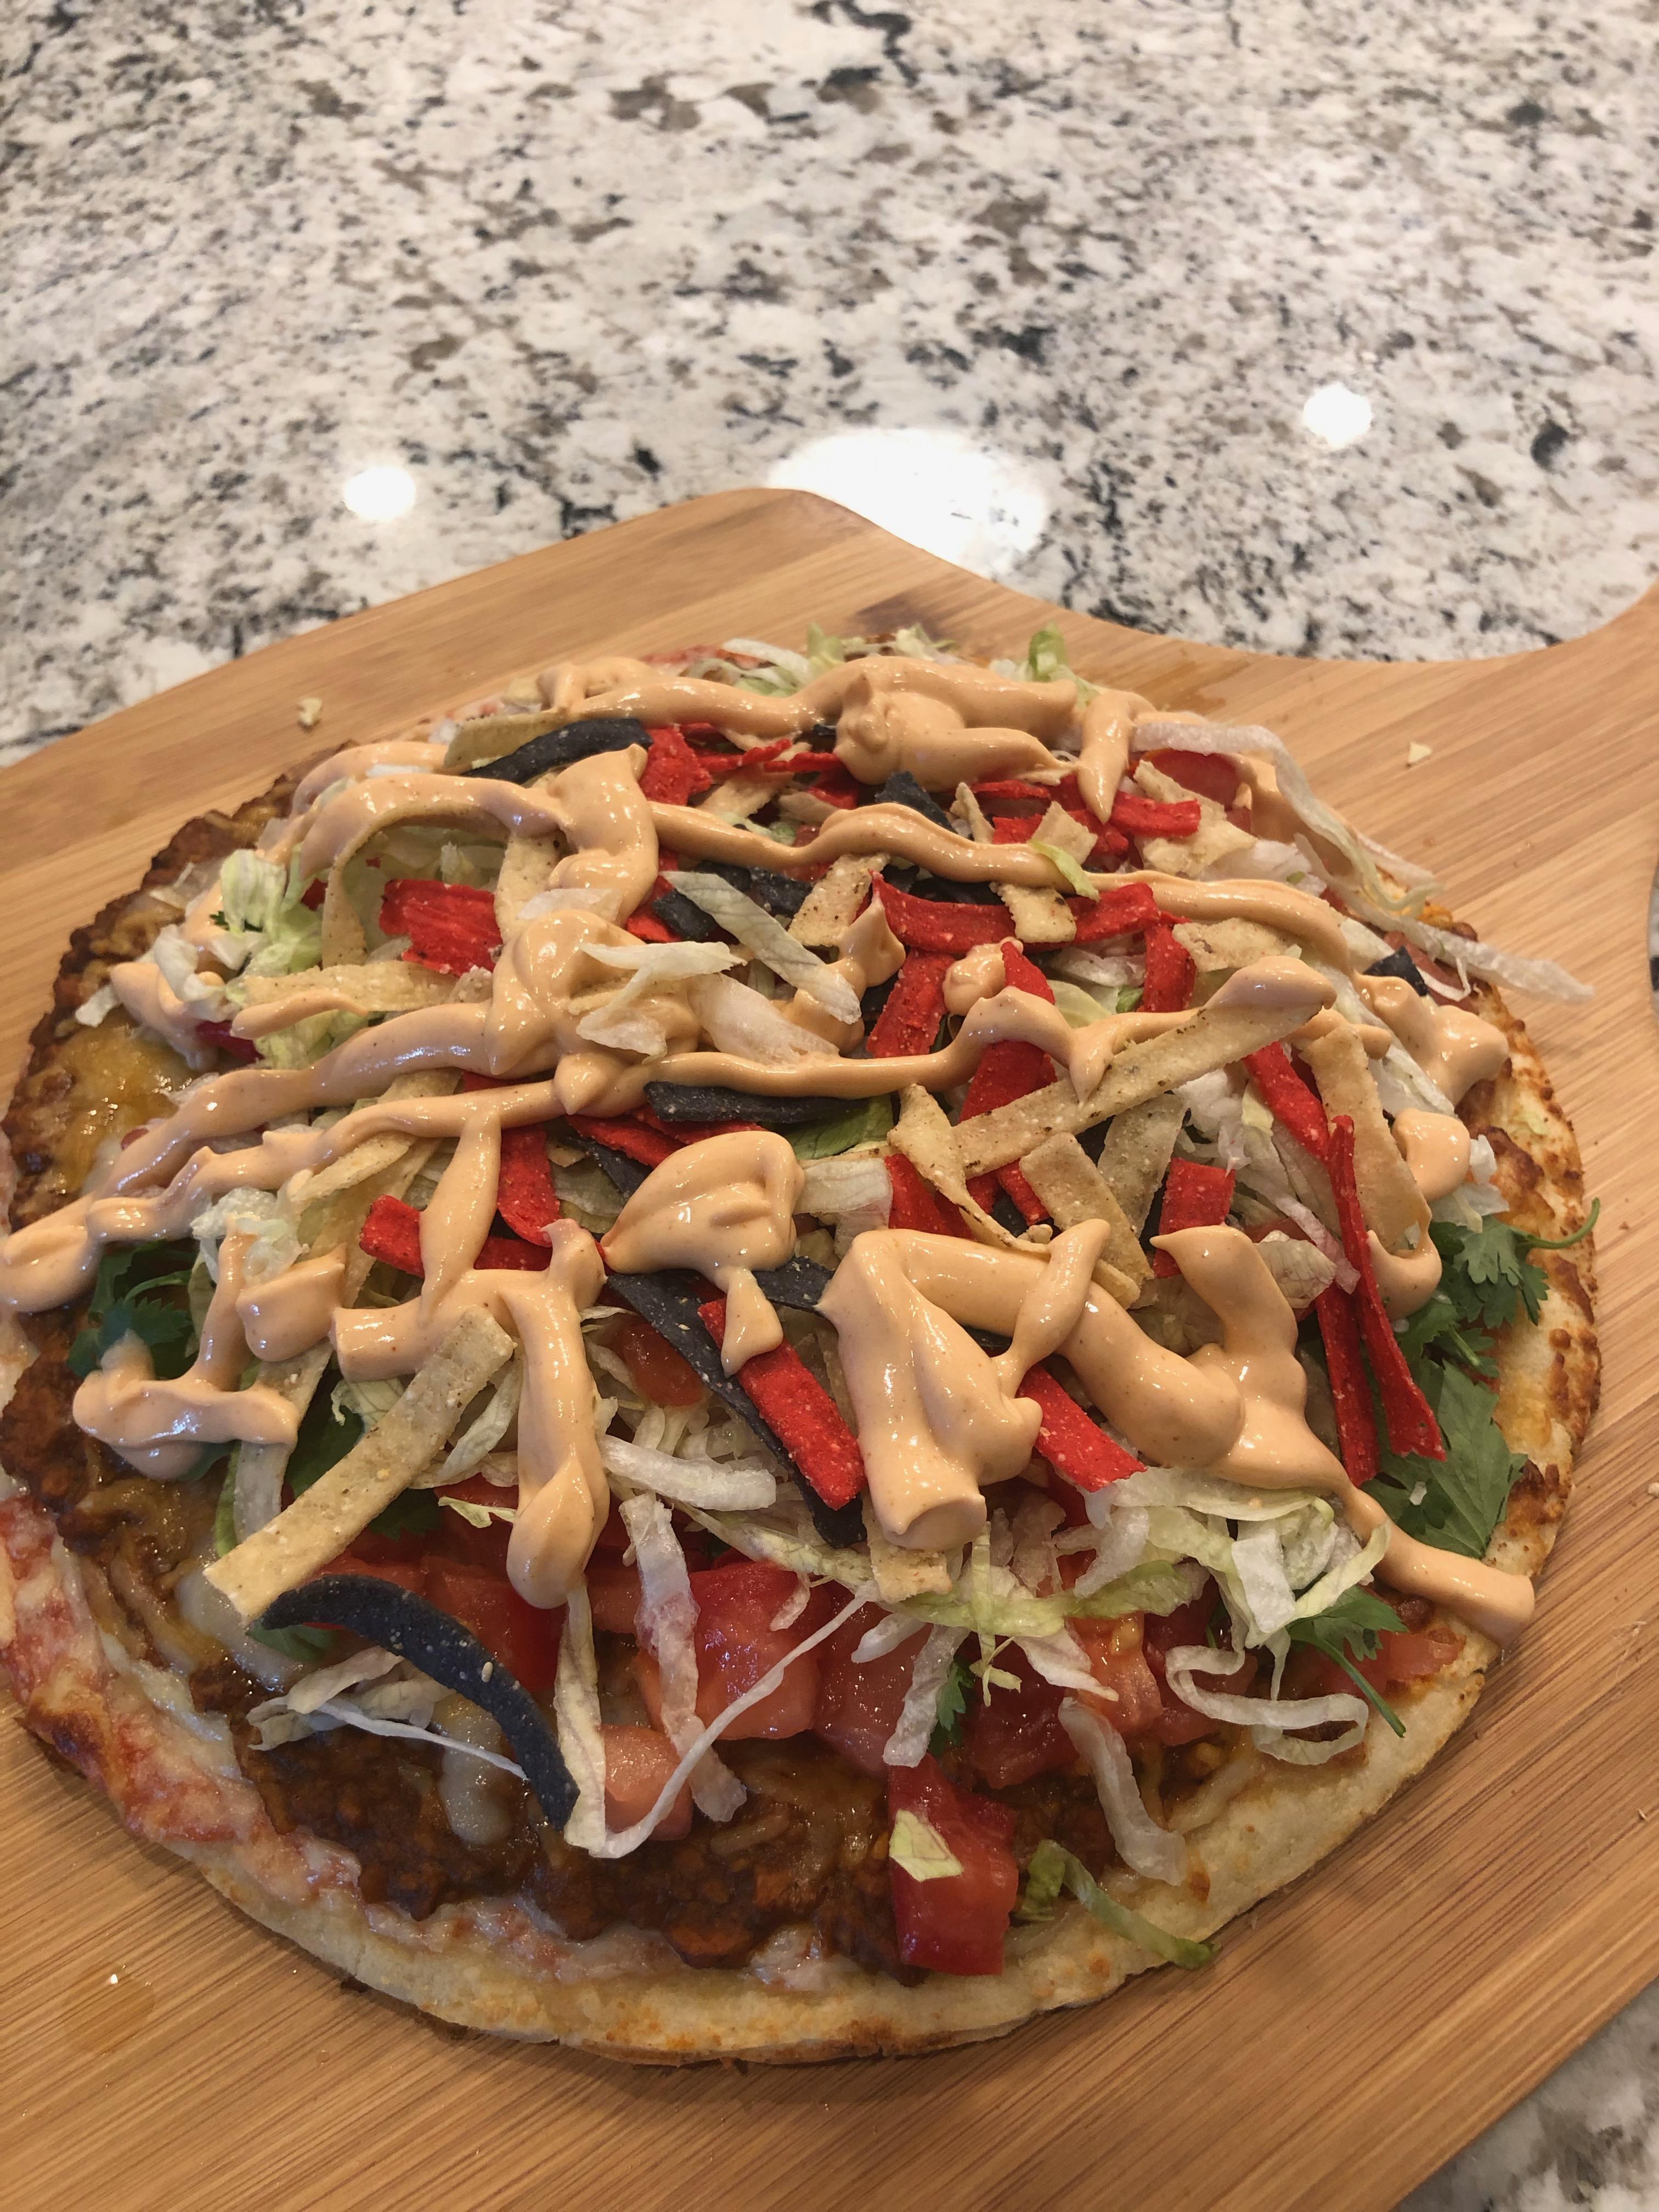 Taco Salad Pizza Terri Frank Ramseyer